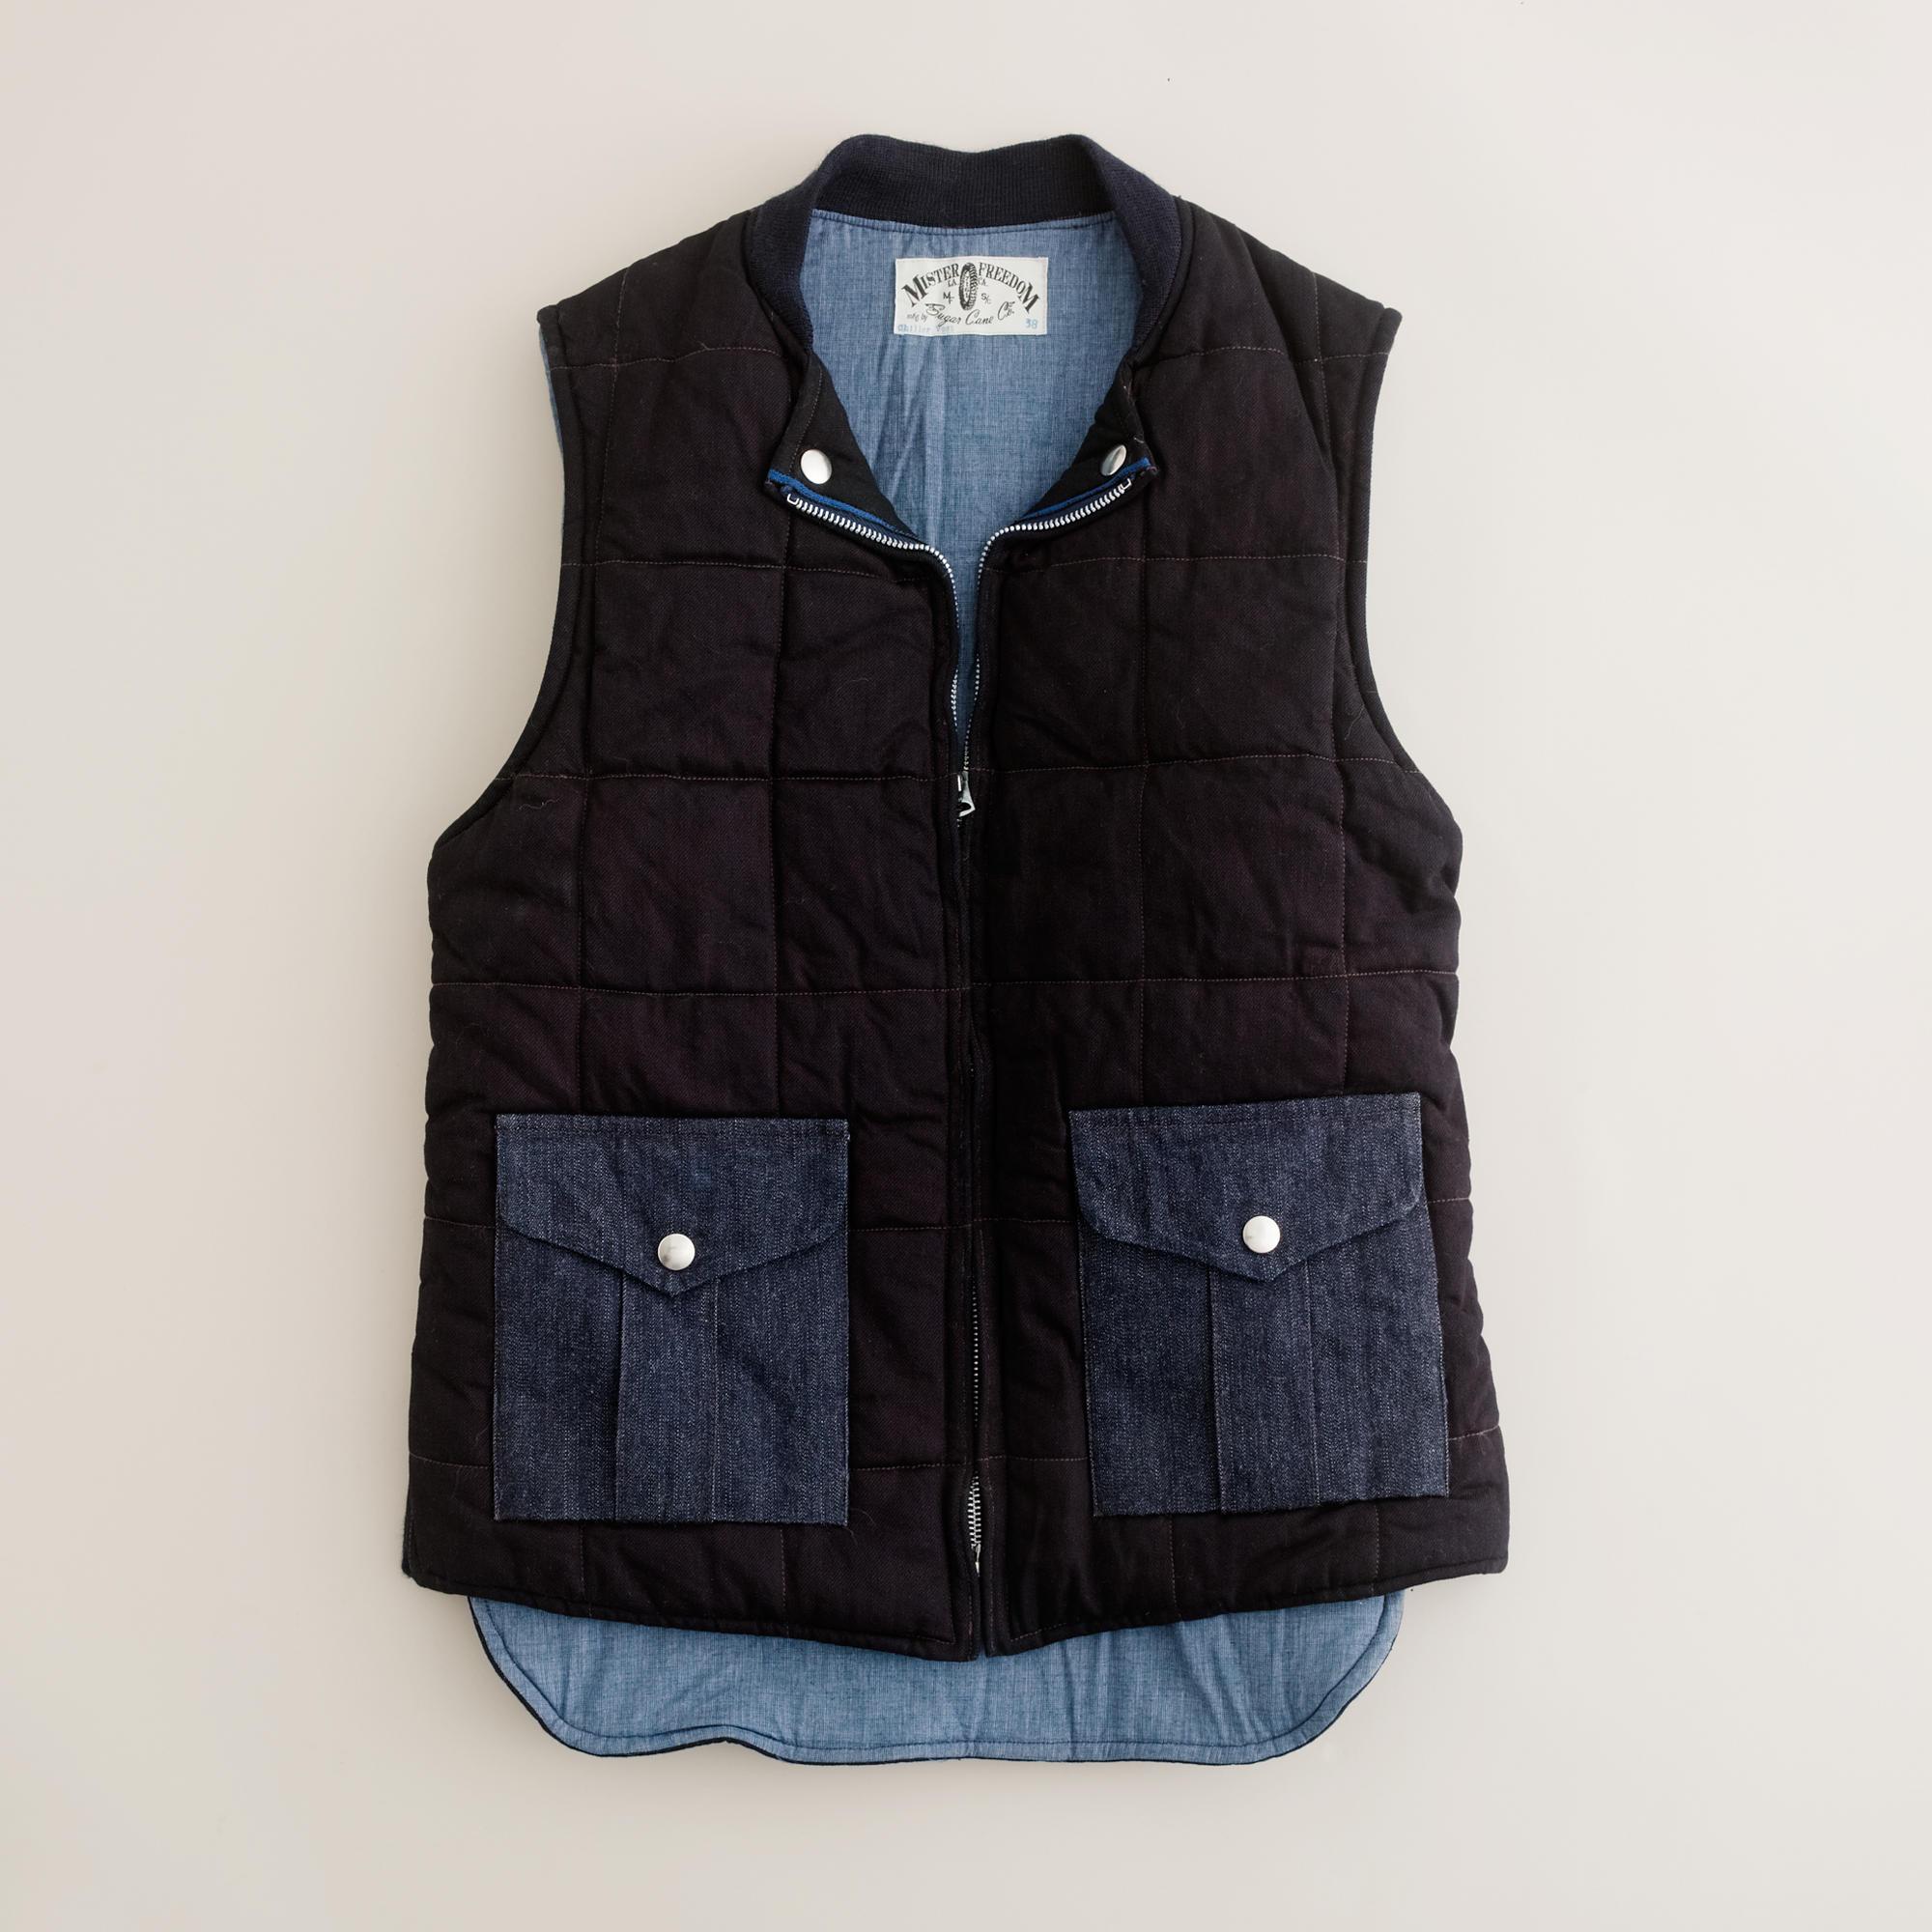 Mister Freedom® midnight chiller vest :